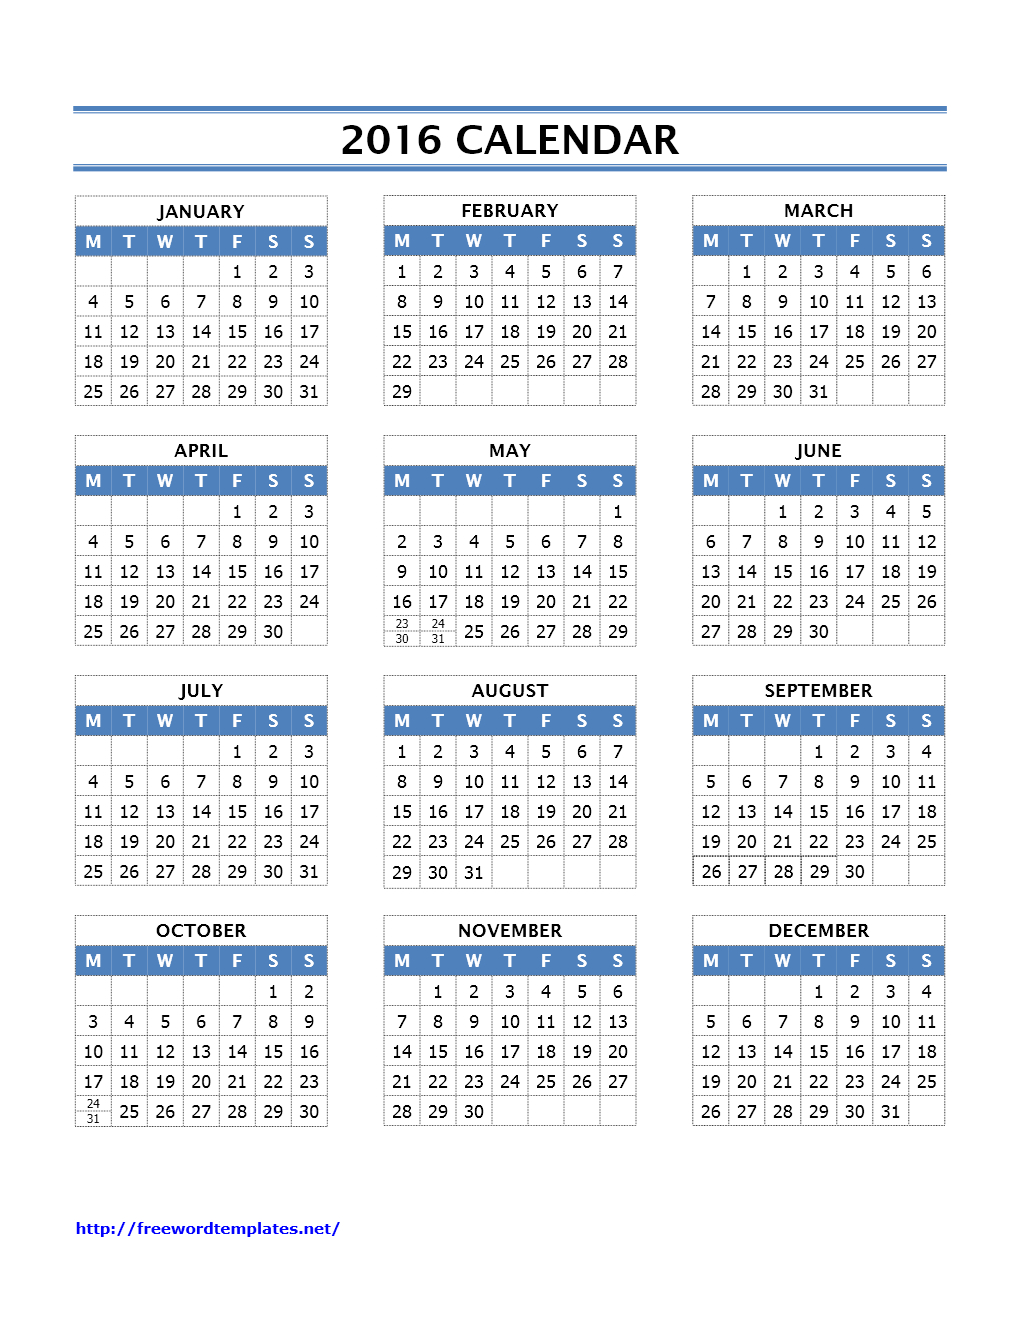 2016 Calendar Templates regarding Editable 2015 Monthly Calendar Template